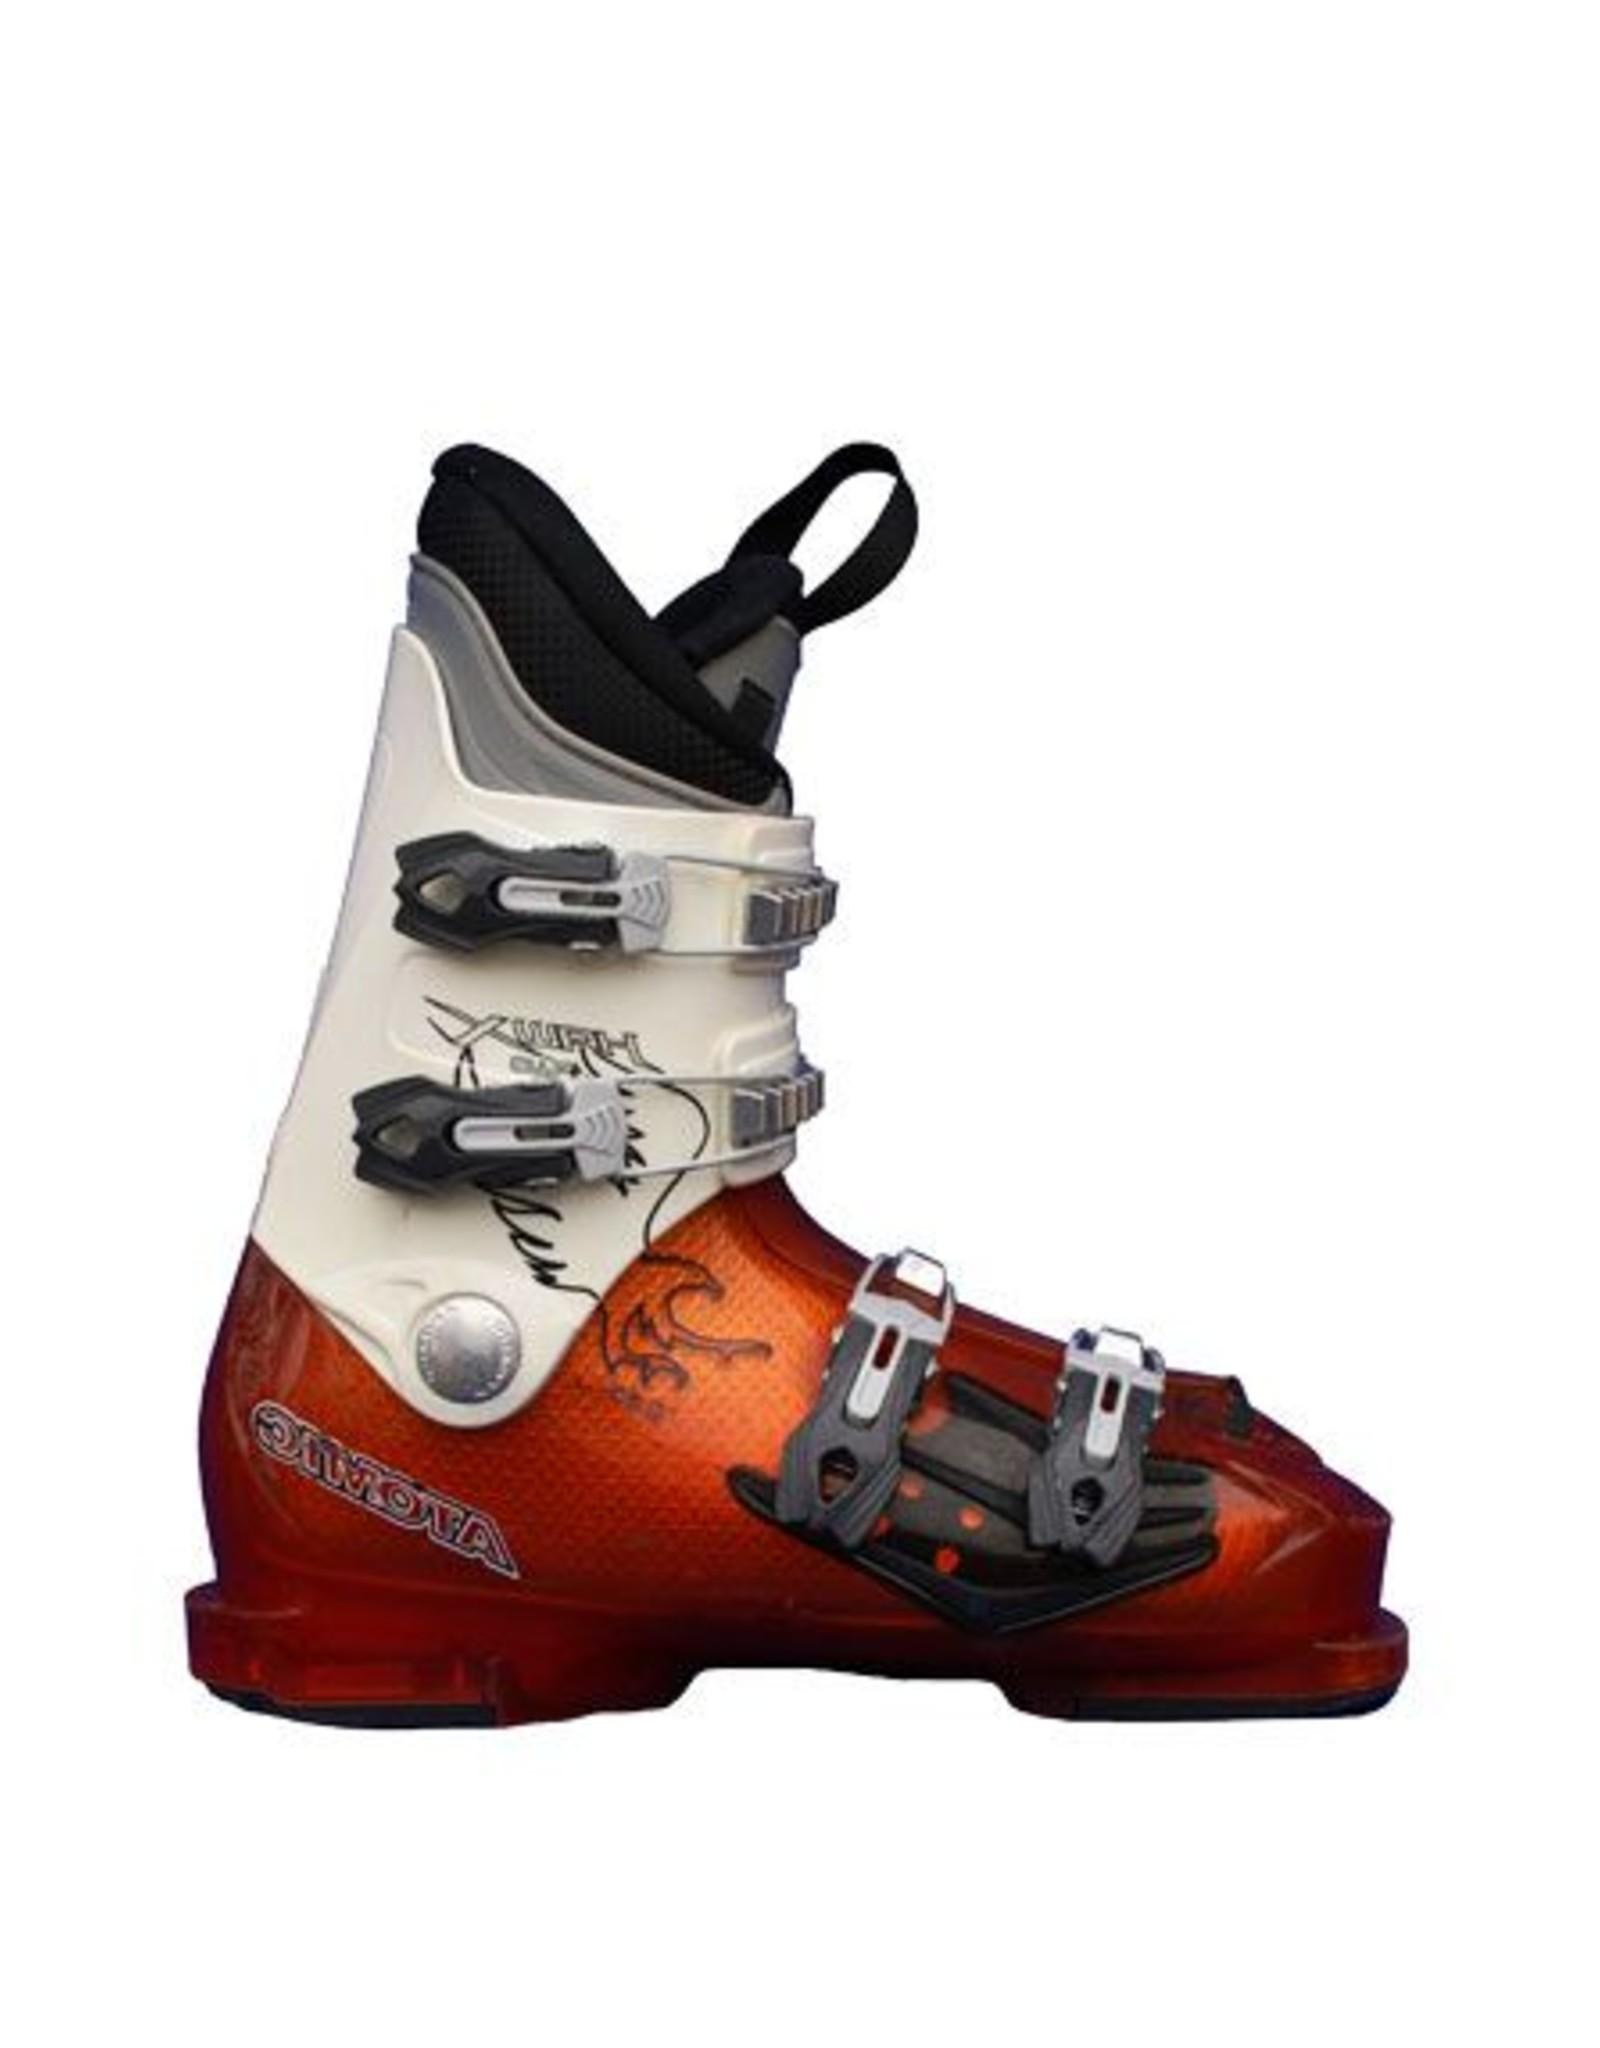 ATOMIC Skischoenen ATOMIC Hawx Plus Oranje/Creme Gebruikt 31 (mondo 20)